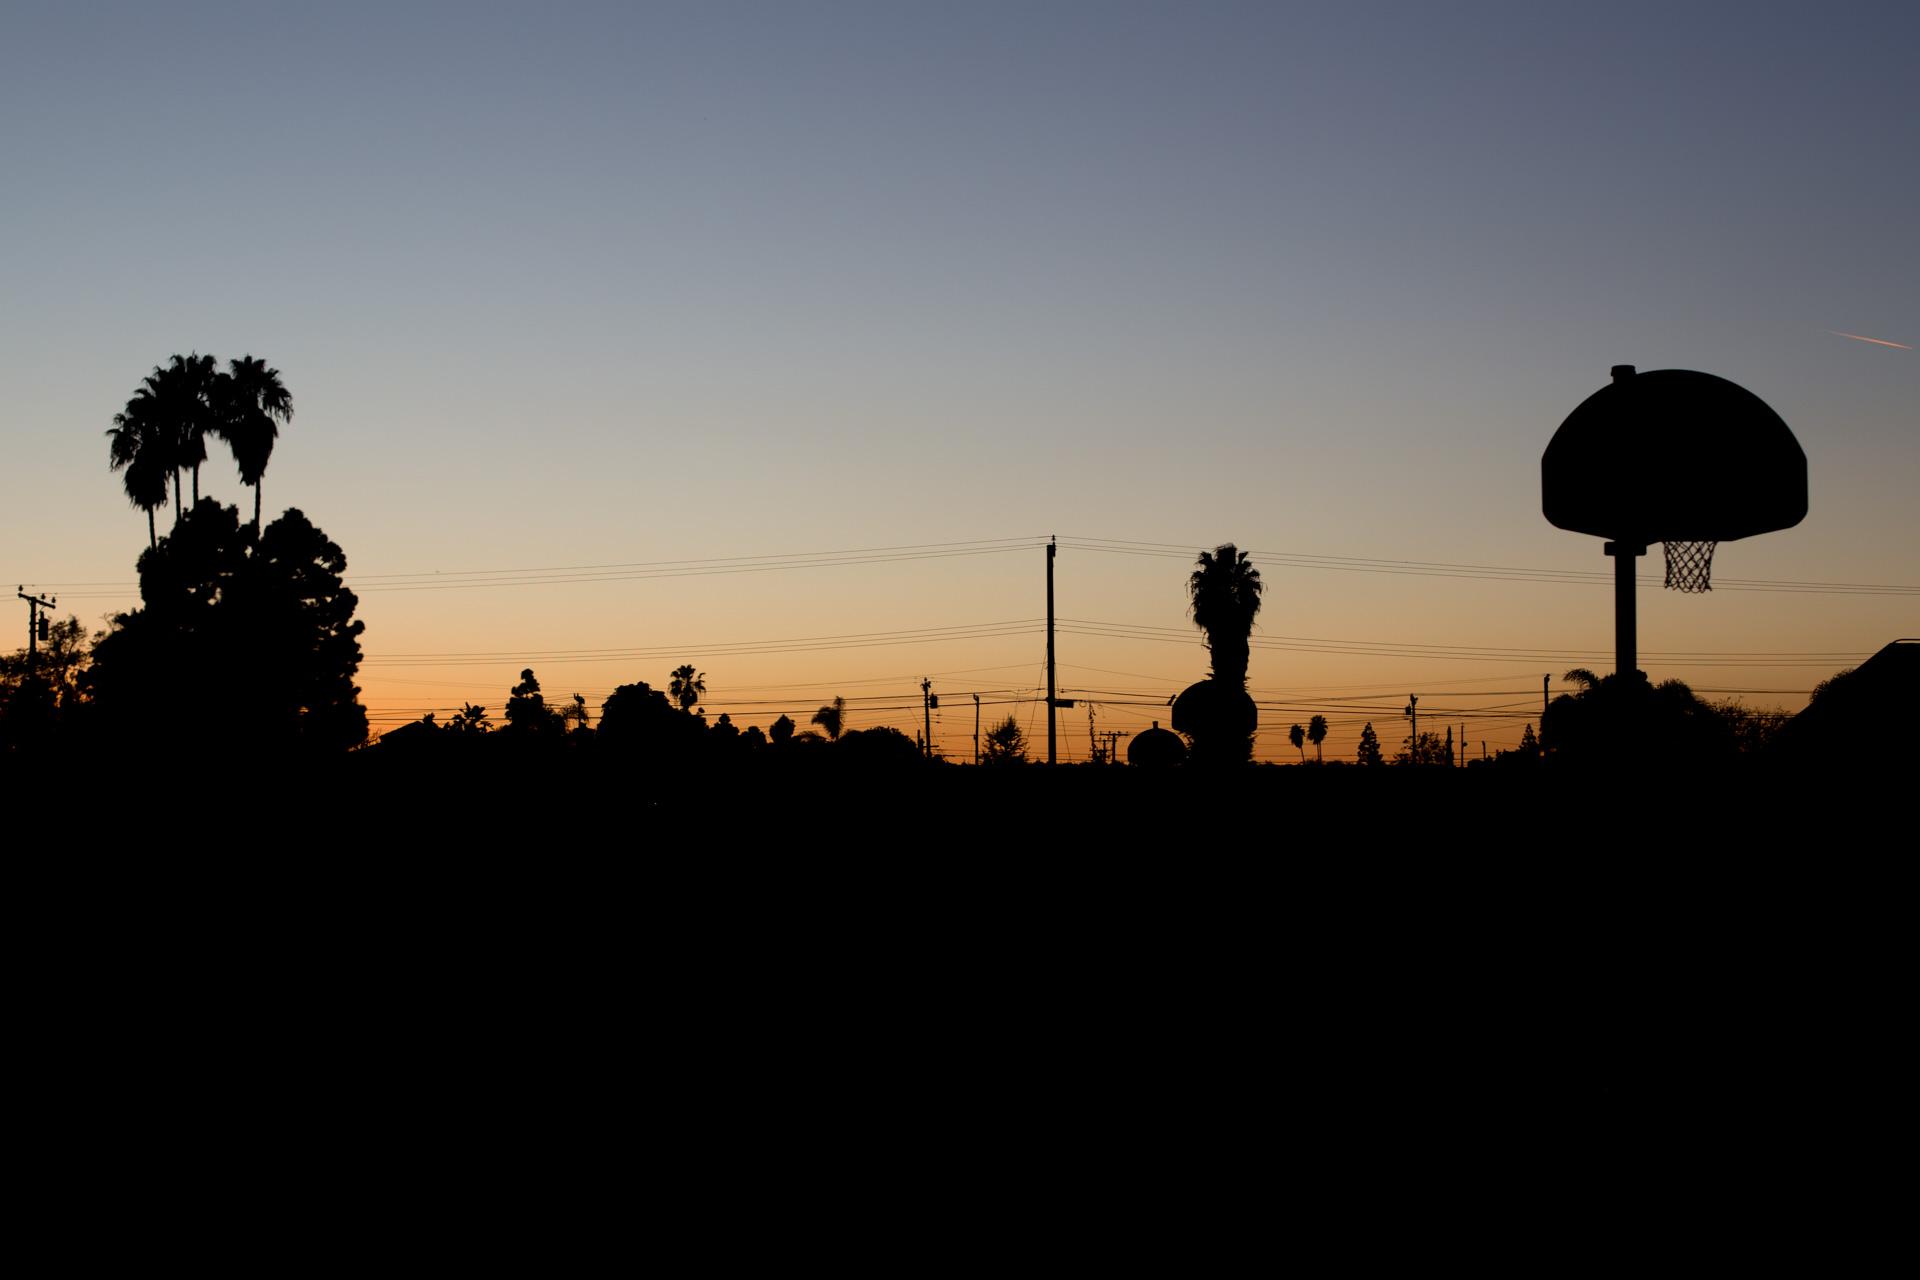 Sunset on the playground